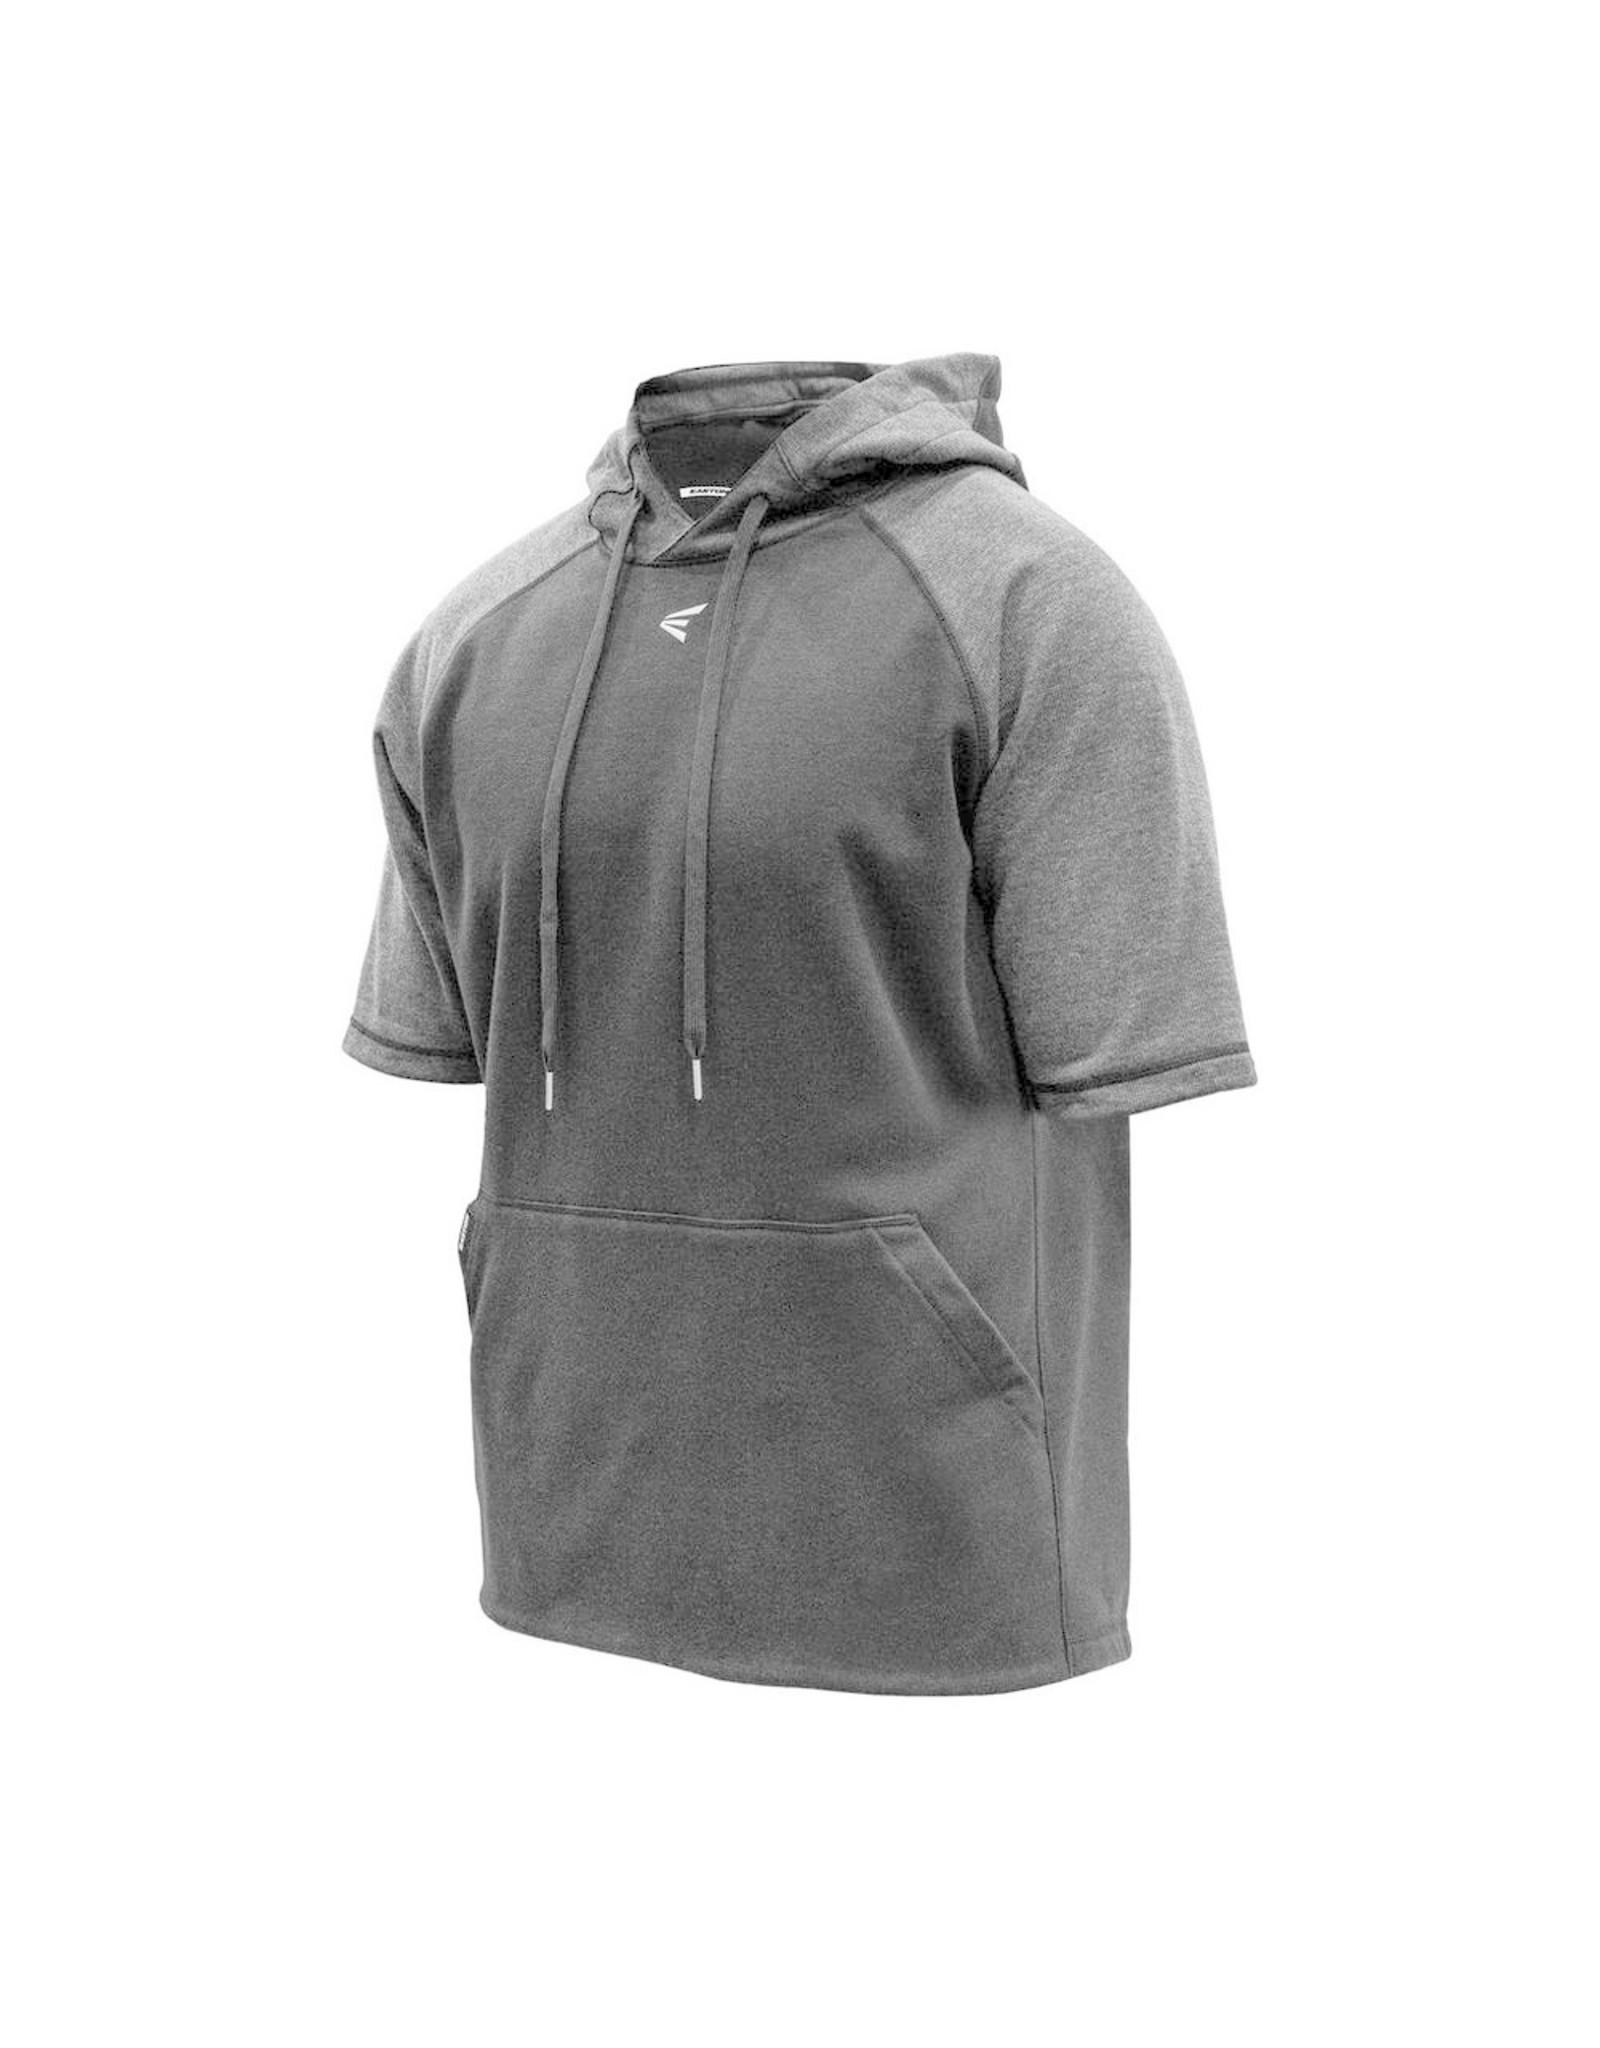 EASTON (CANADA) EASTON- Short Sleeve PERF Hoody